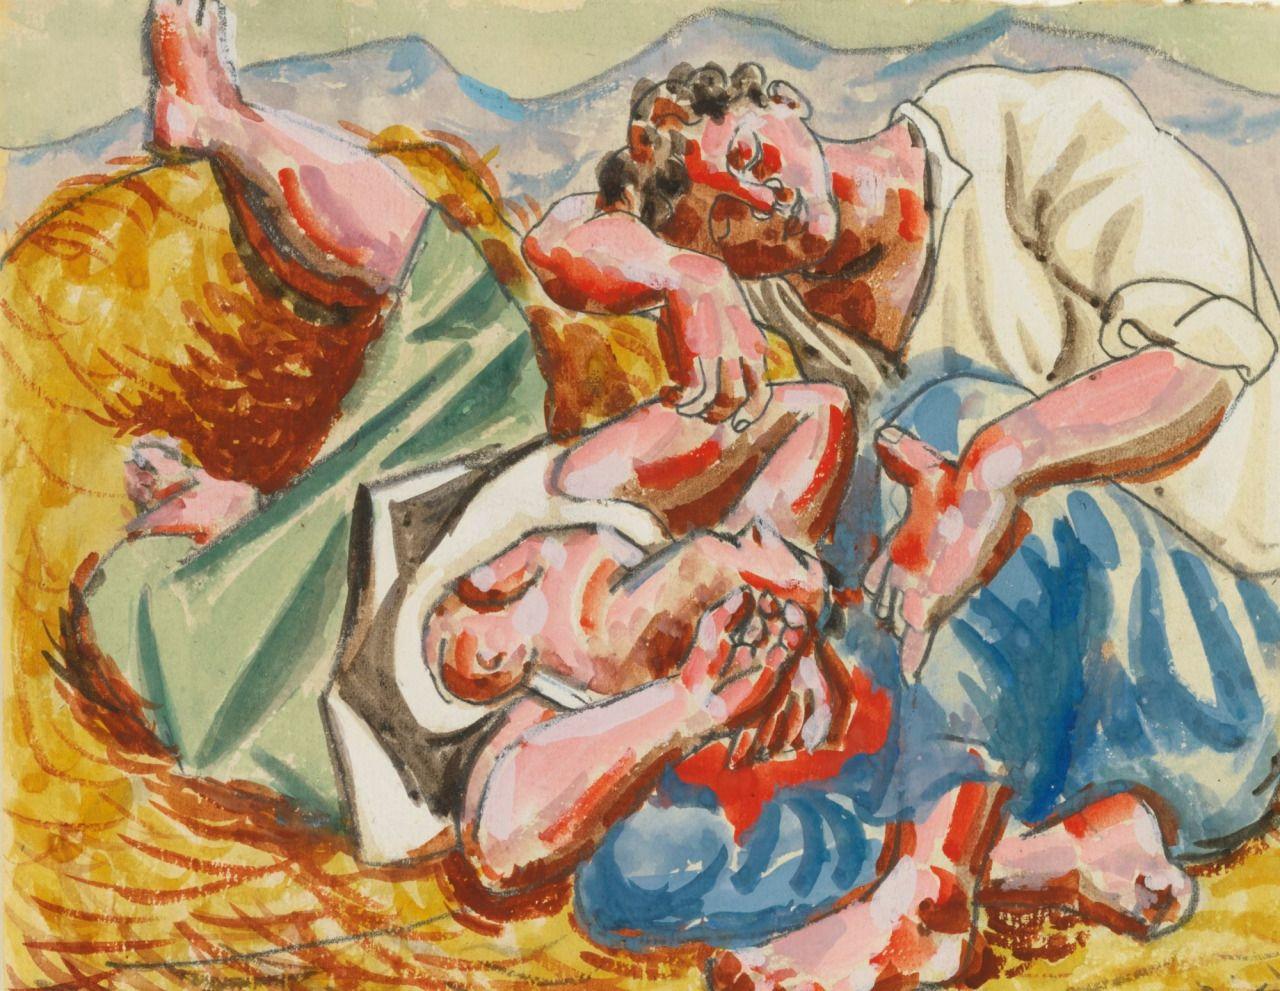 Pablo Picasso - Le Sieste - 1921